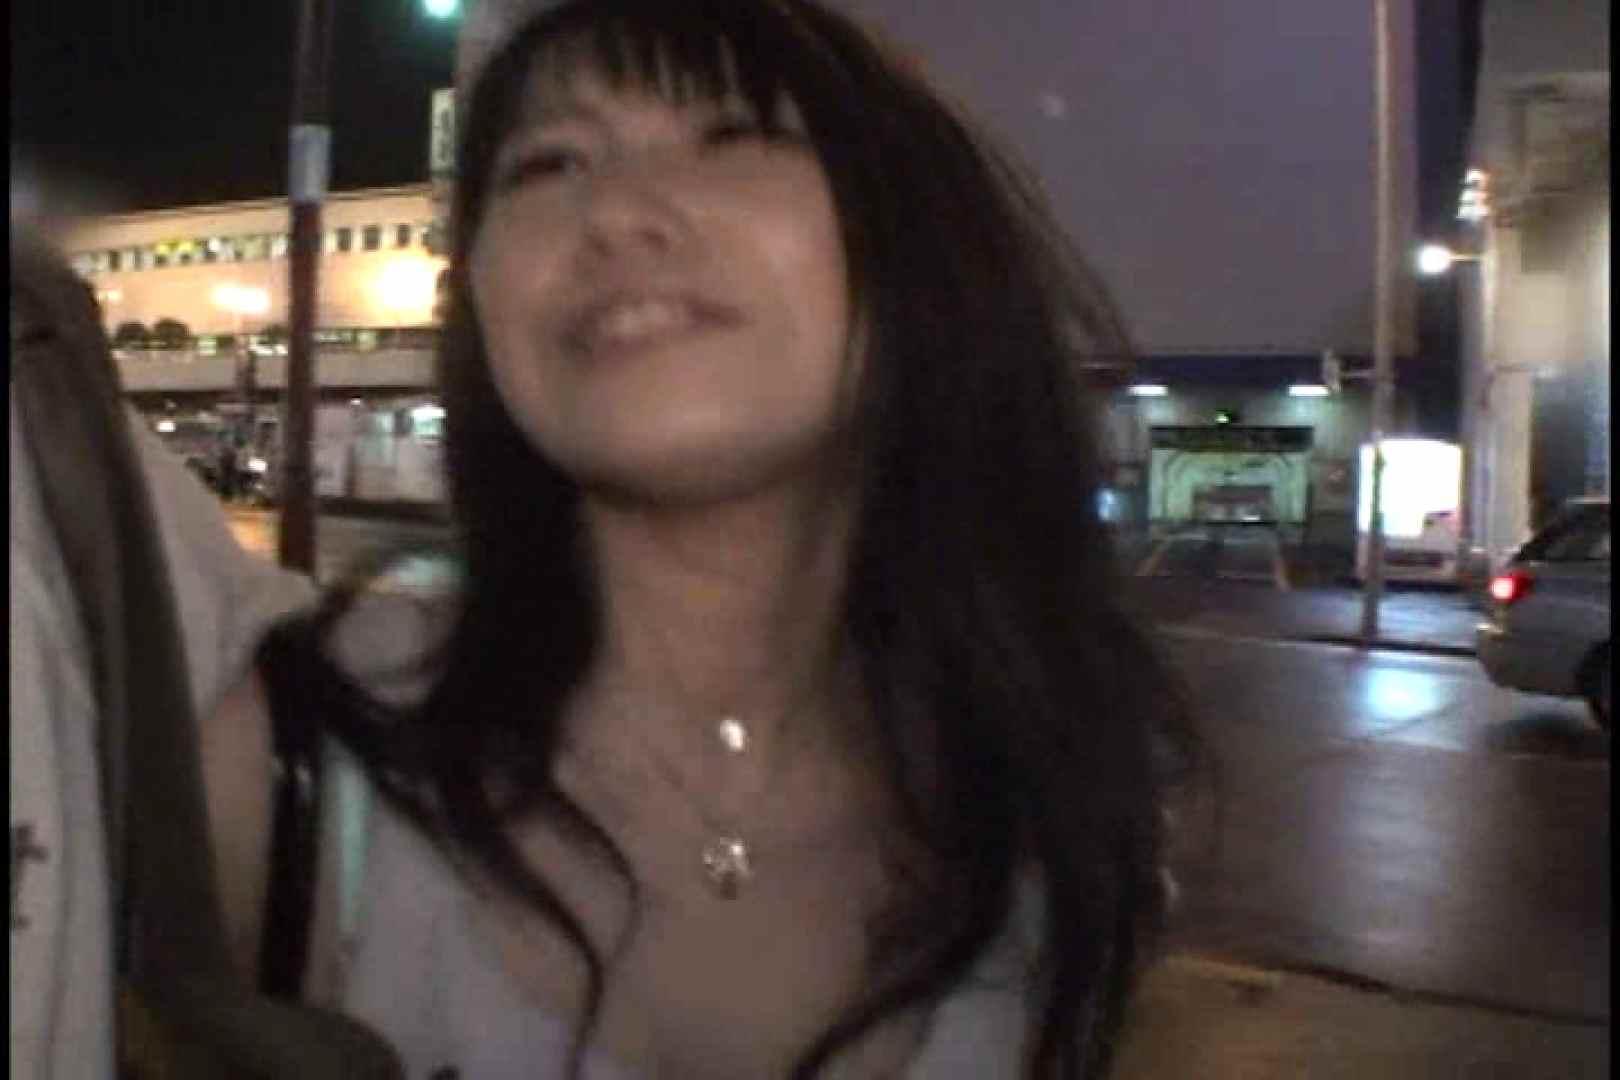 JDハンター全国ツアー vol.028 後編 女子大生のエロ動画   0  111PIX 3